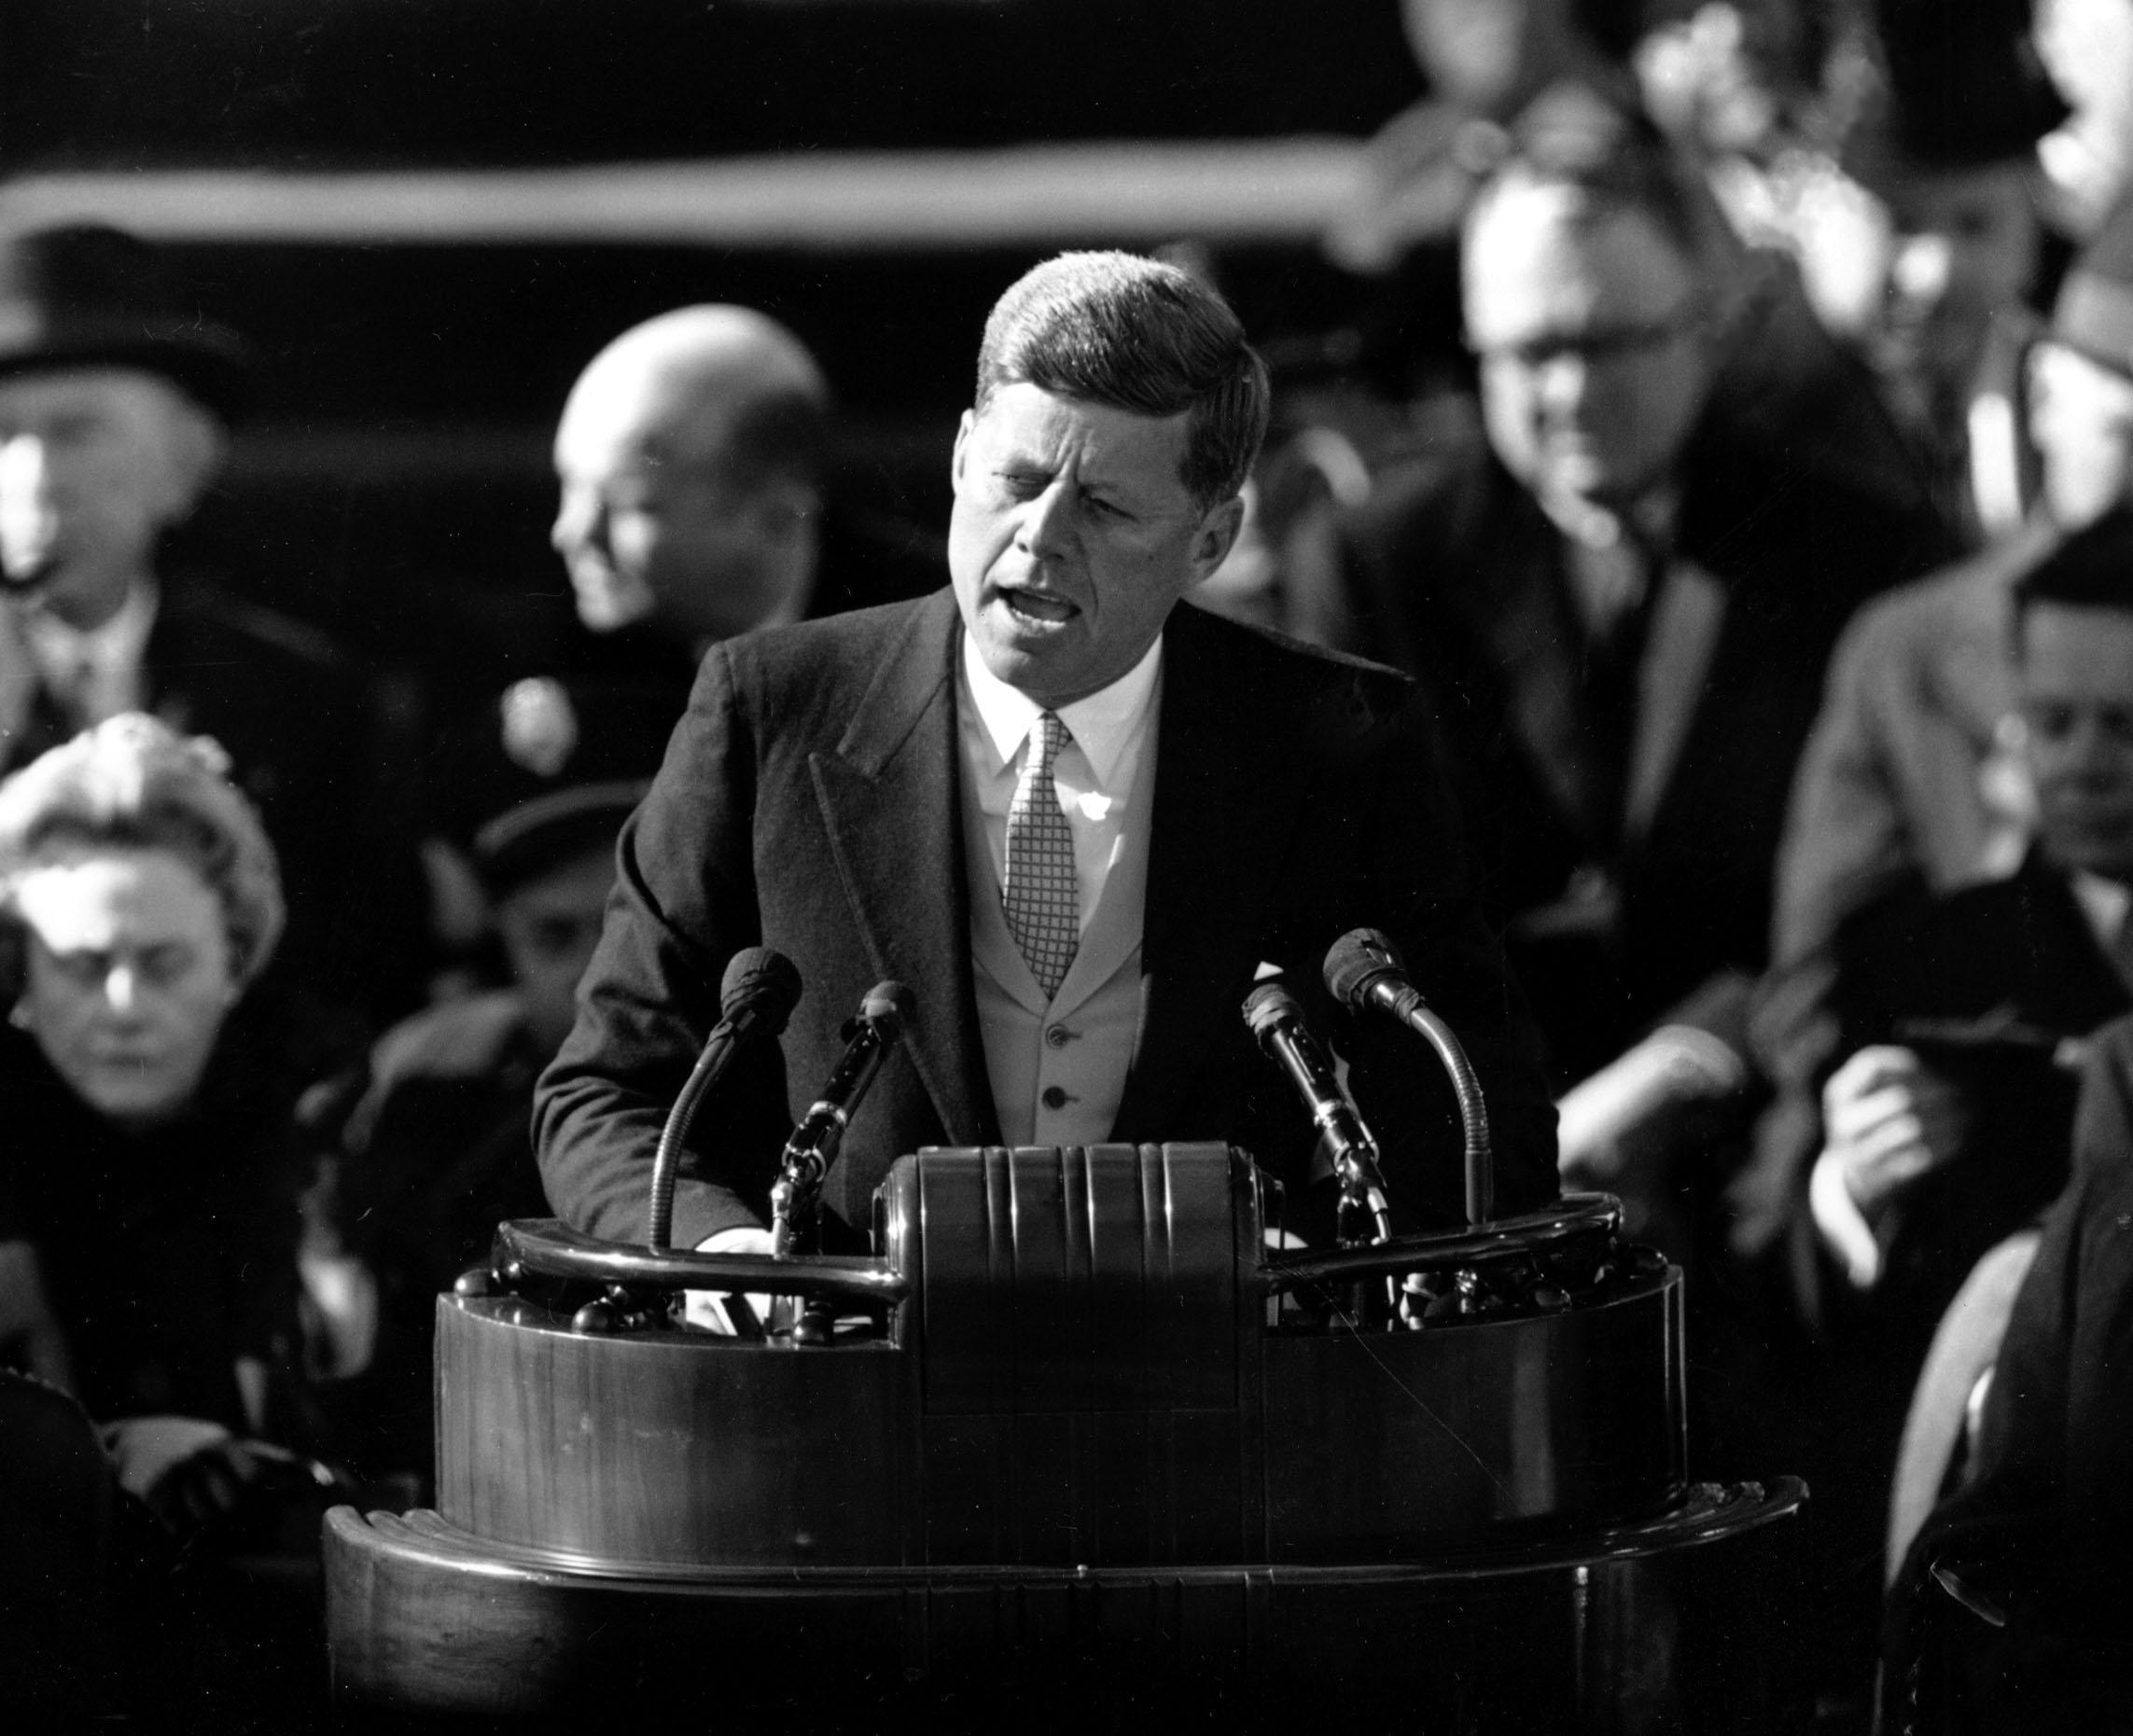 John F Kennedy Inaugural Address Jan 20